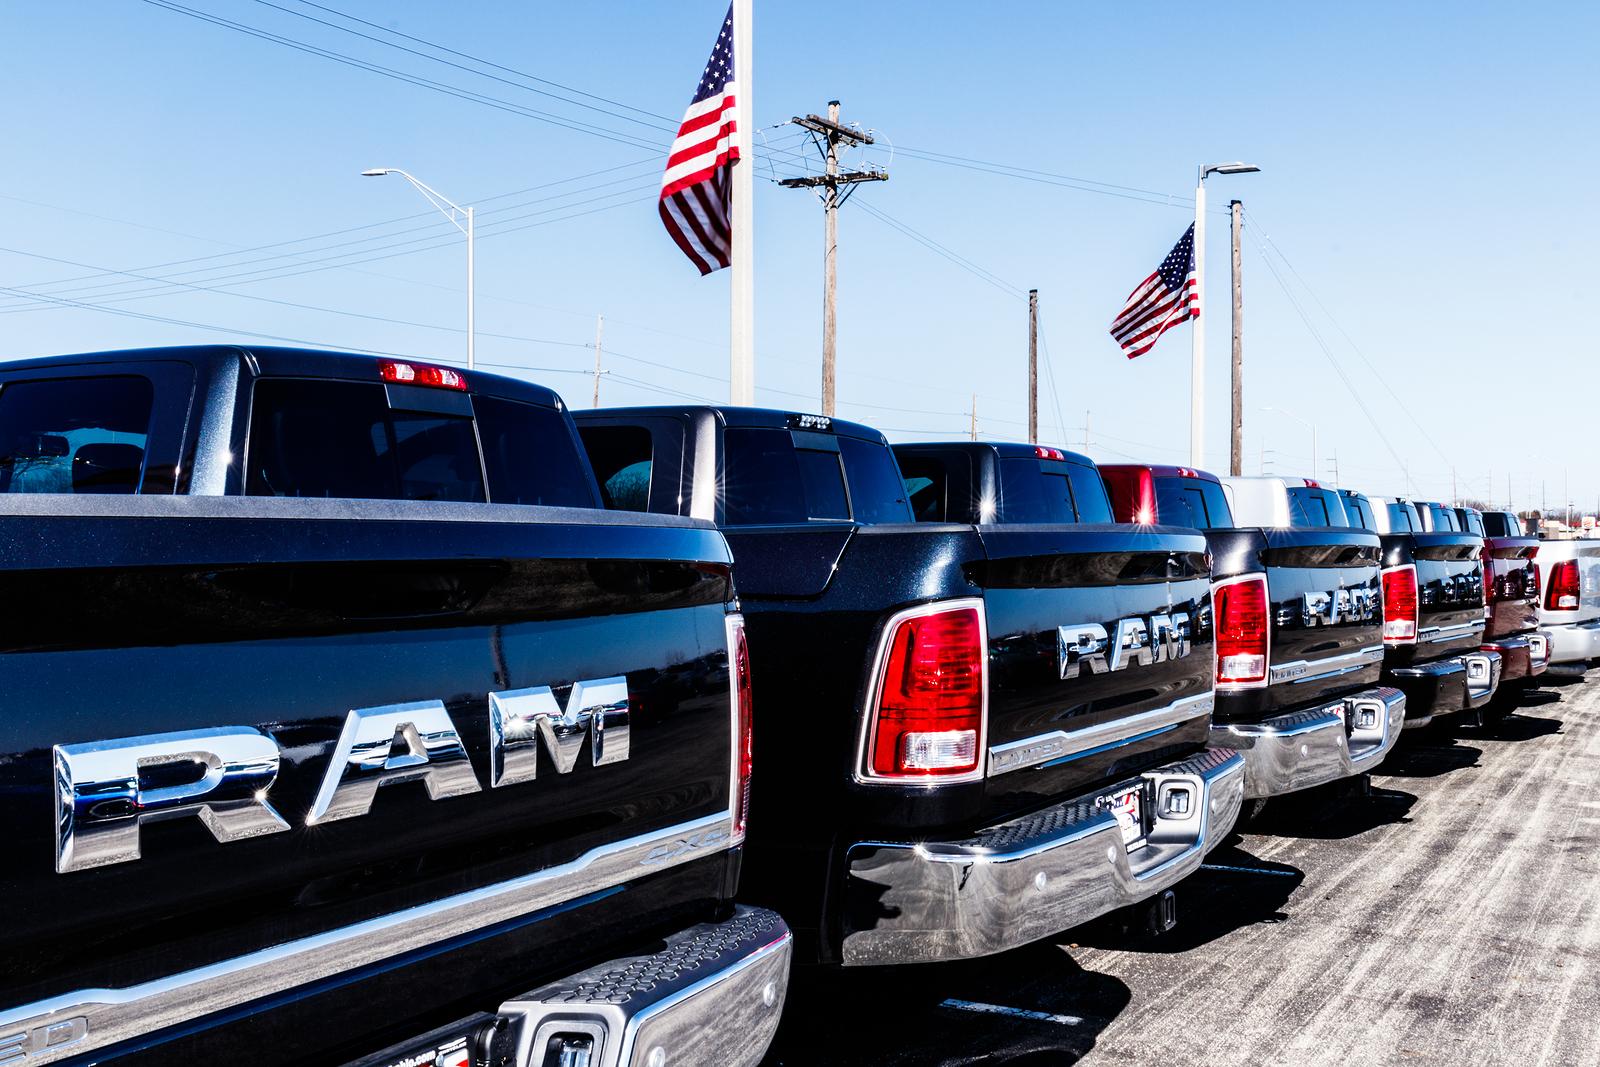 DOJ, EPA Fine Chrysler $305 Million Over Emissions Test